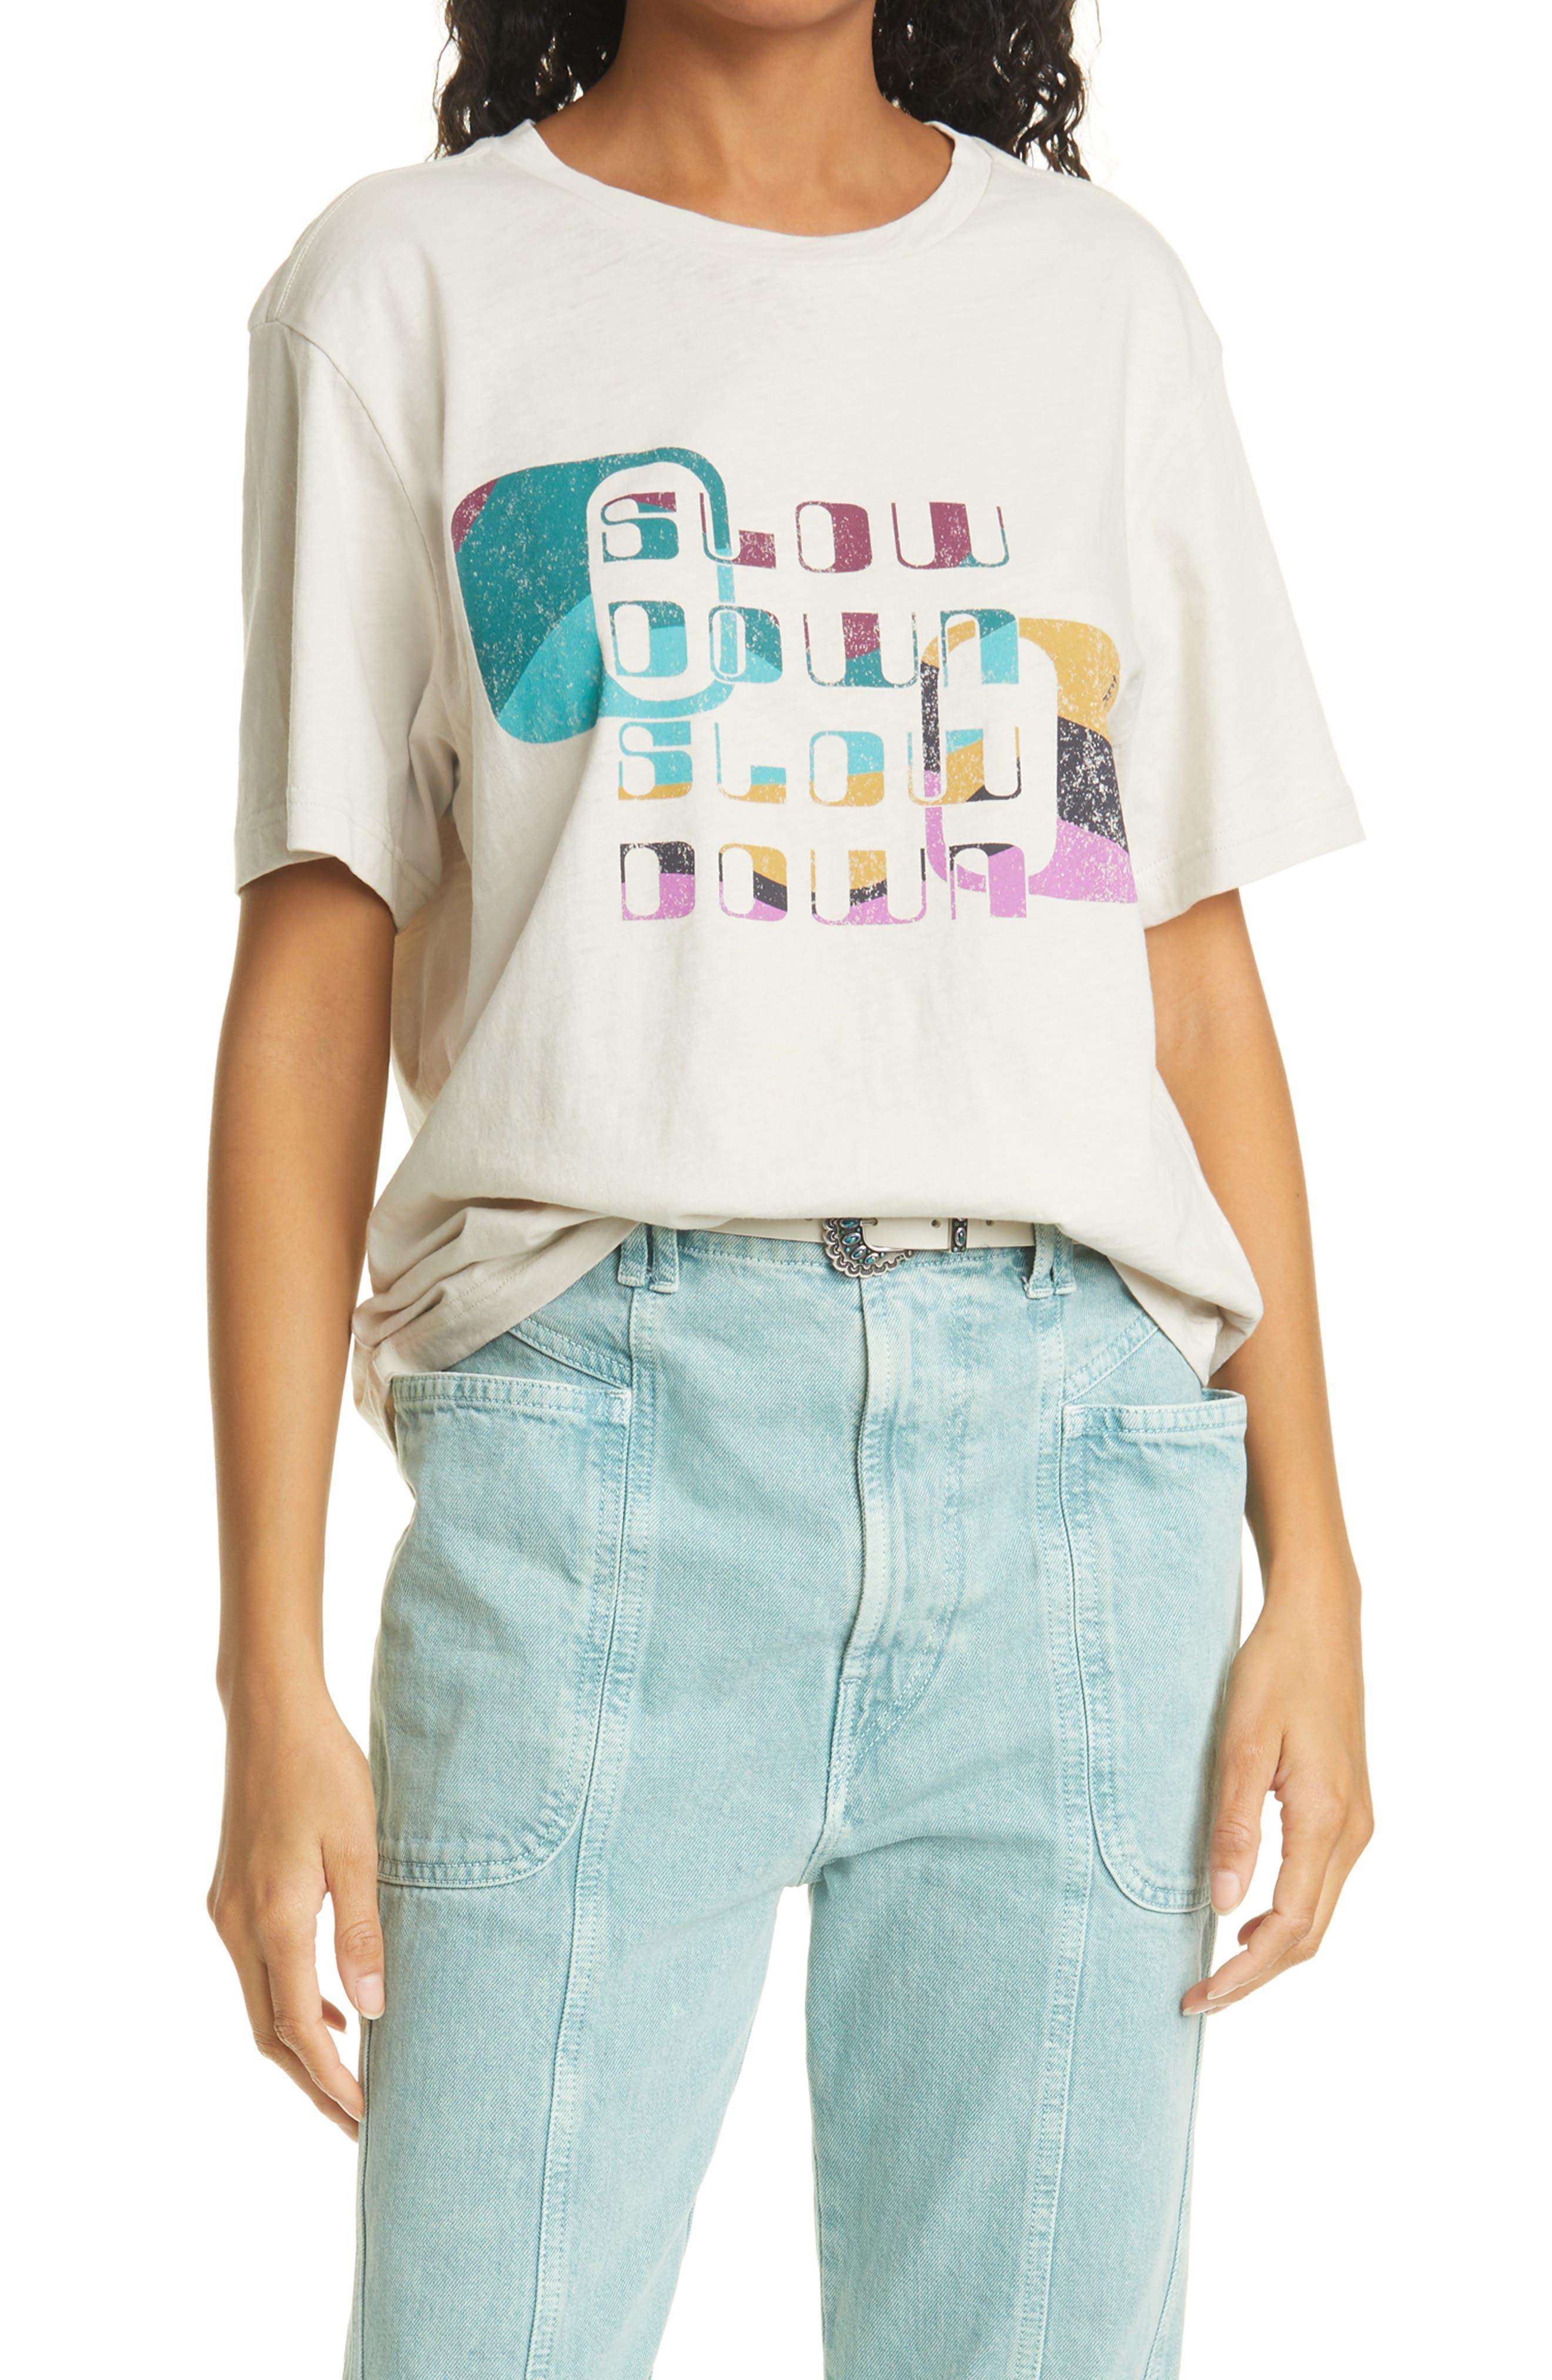 Isabel Marant Etoile Slow Down Cotton Graphic Tee